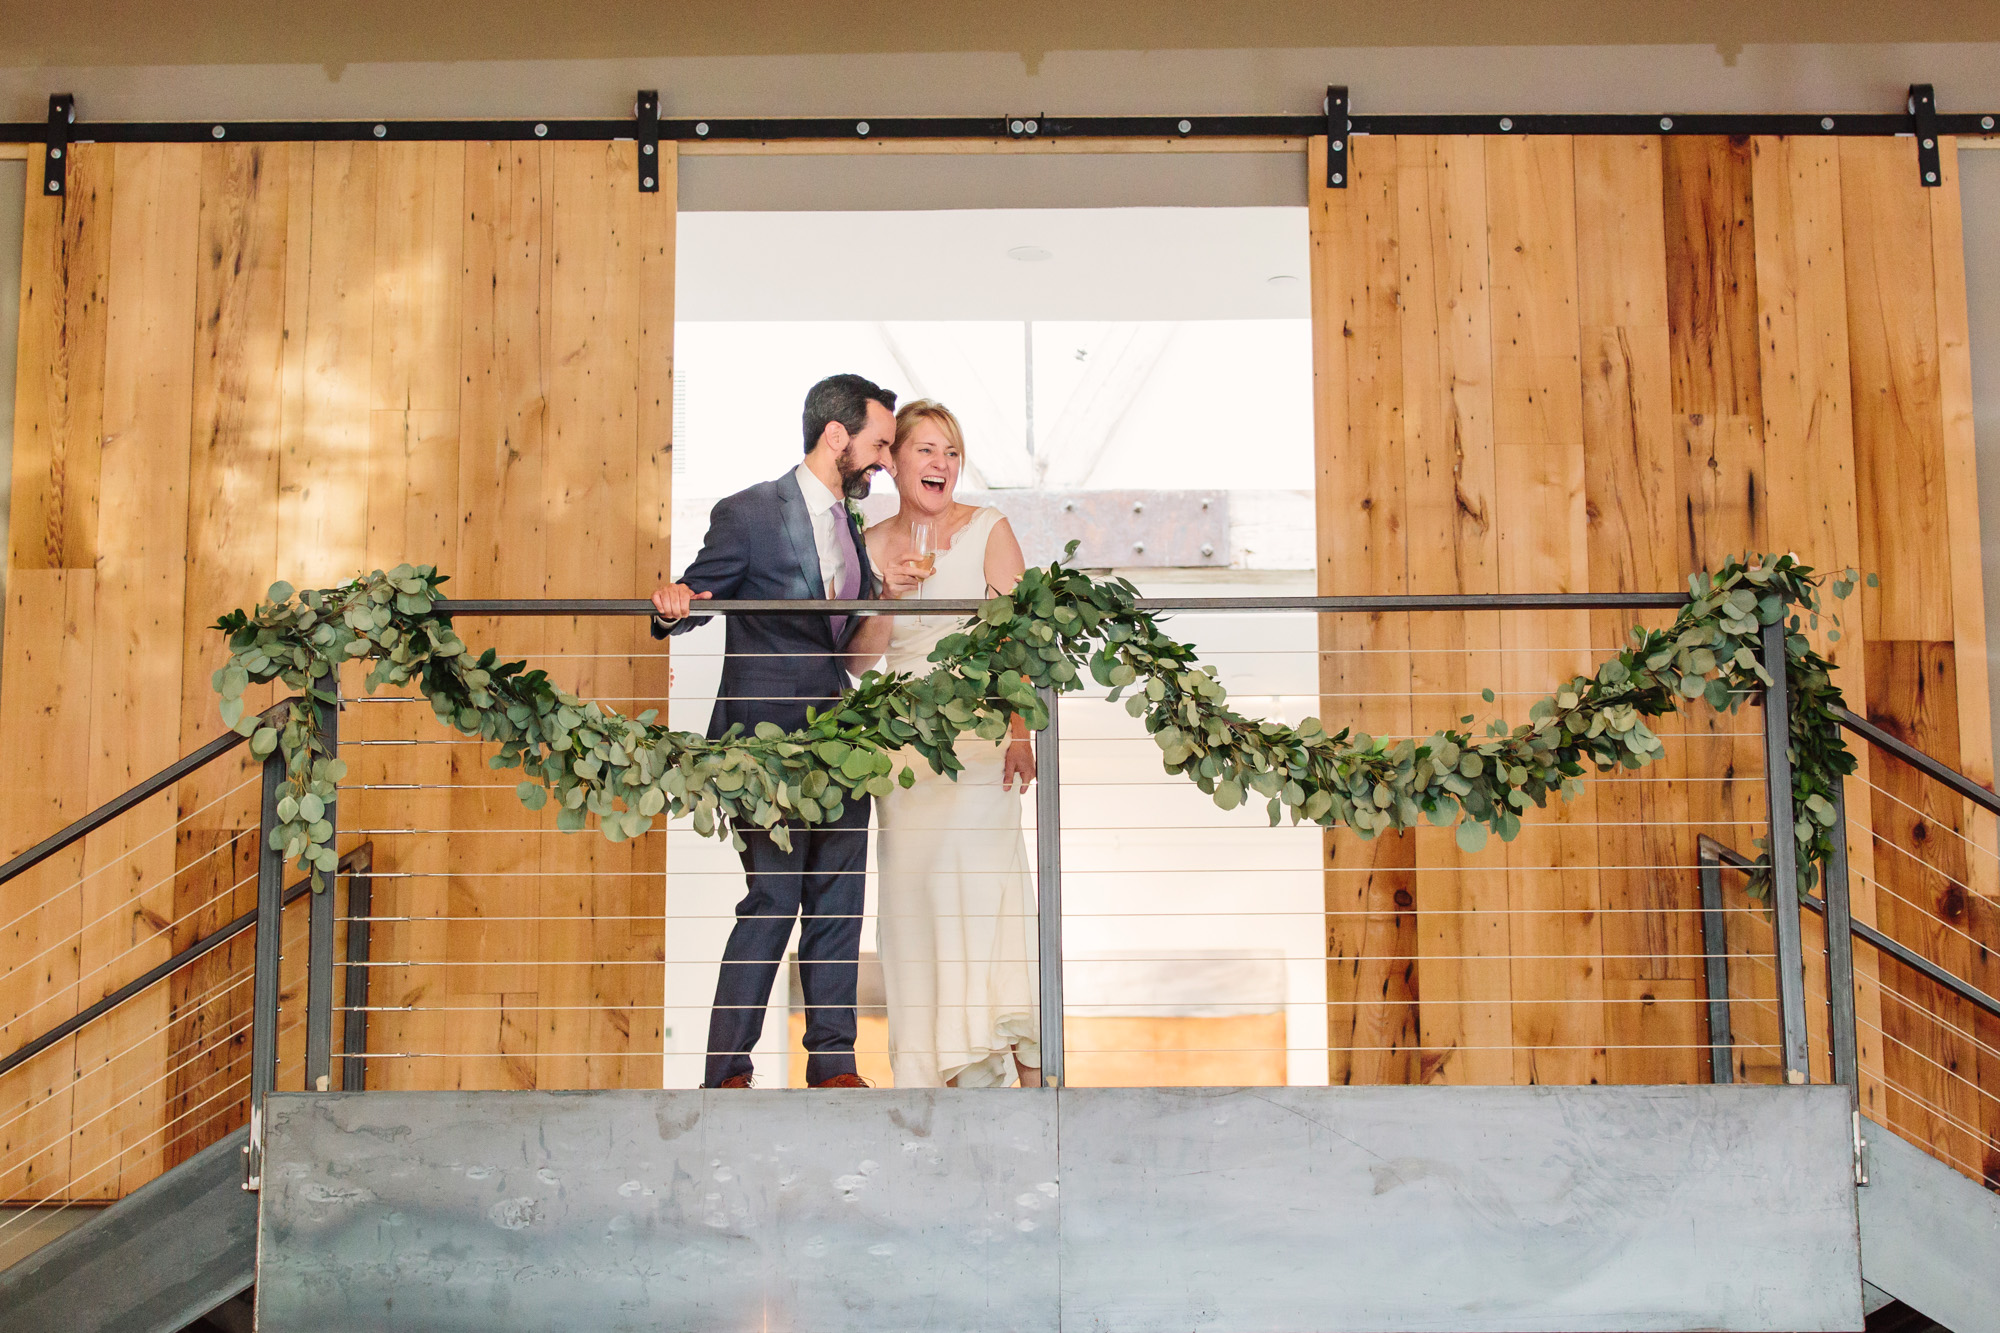 67_Rowan_Brian_The_Roundhouse_Wedding_Beacon_NY_Tanya_Salazar_Photography_726.jpg